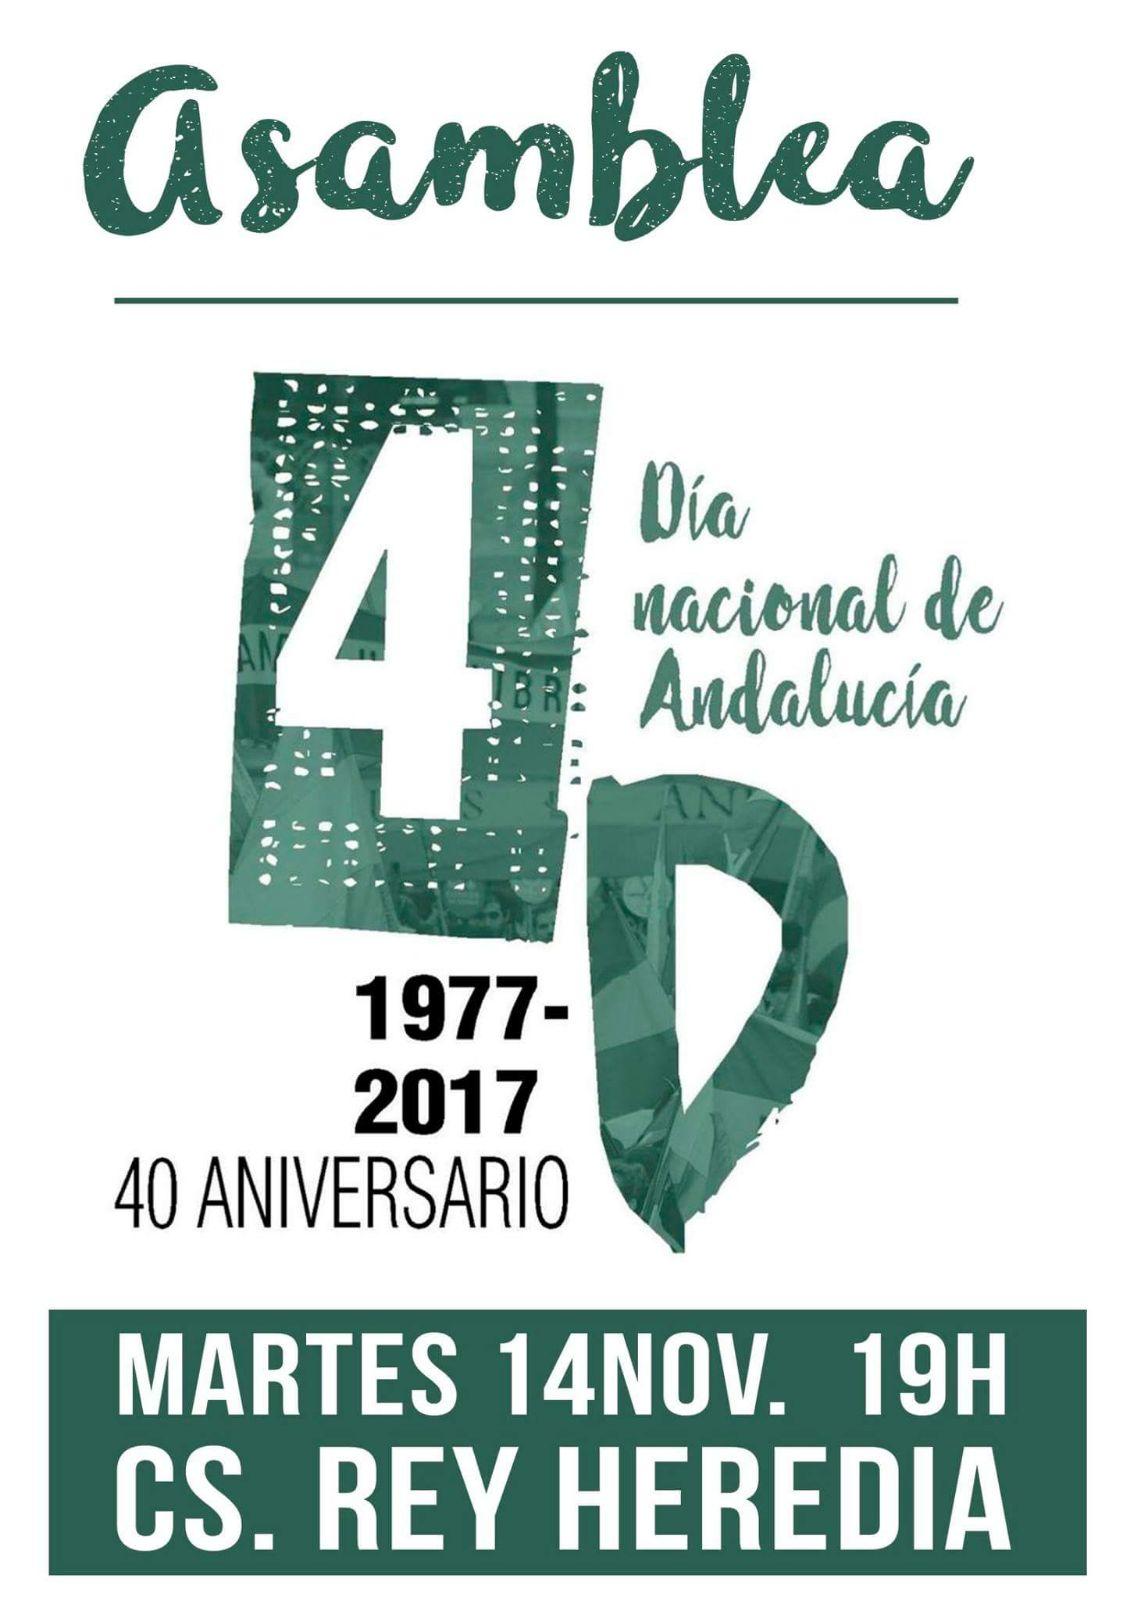 CÓRDOBA, MARTES 14 Noviembre: ASAMBLEA sobre el 4D.   MANIFESTACIÓN 3 de DICIEMBRE EN MÁLAGA.